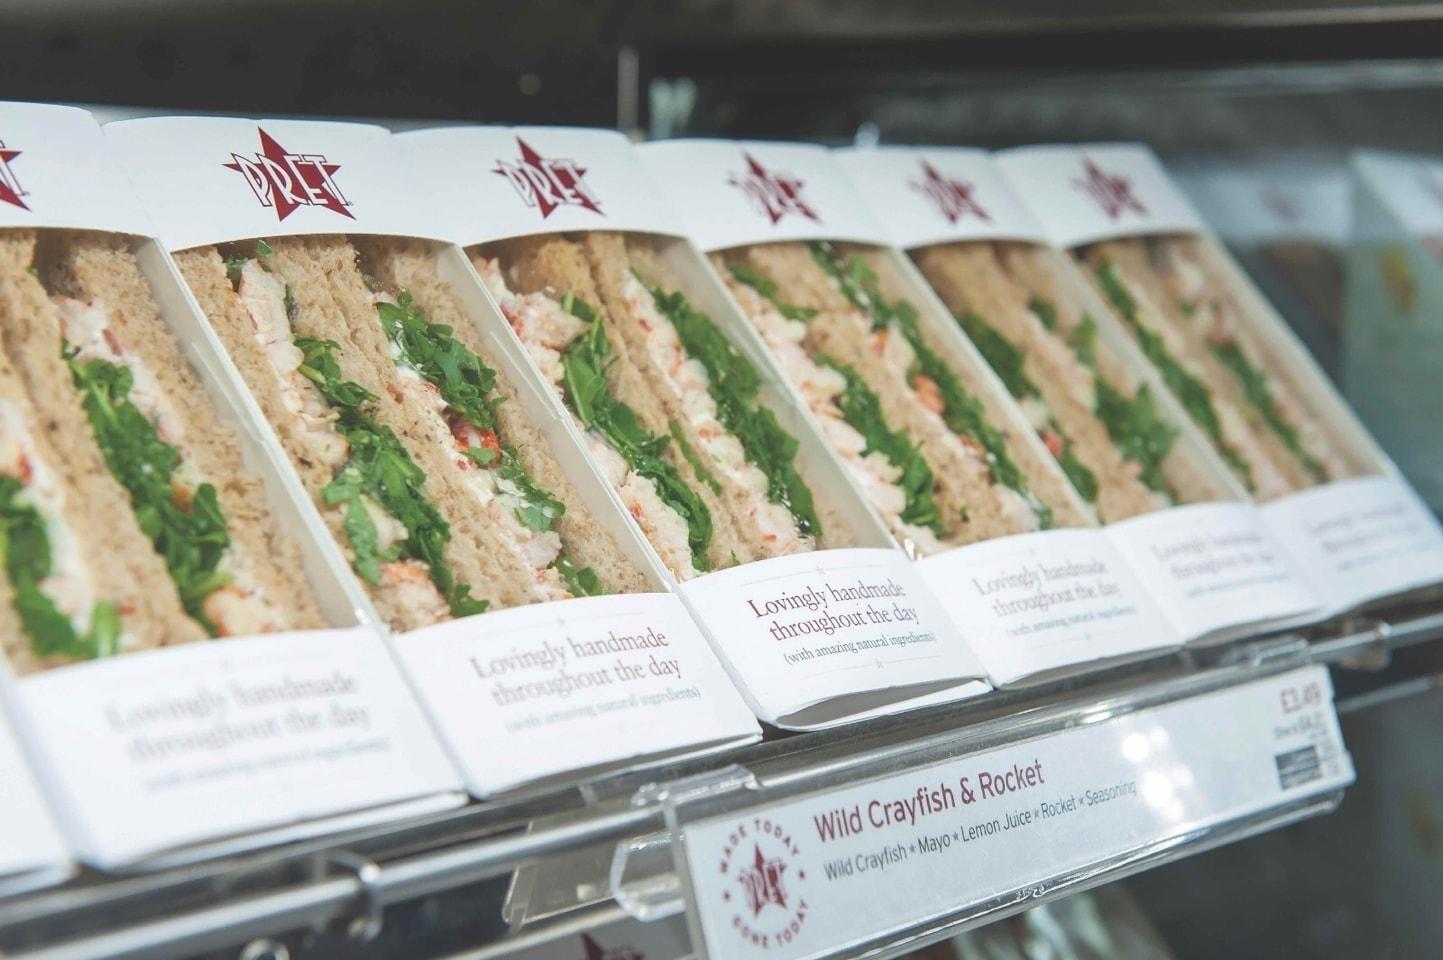 Pret free range egg mayo sandwich